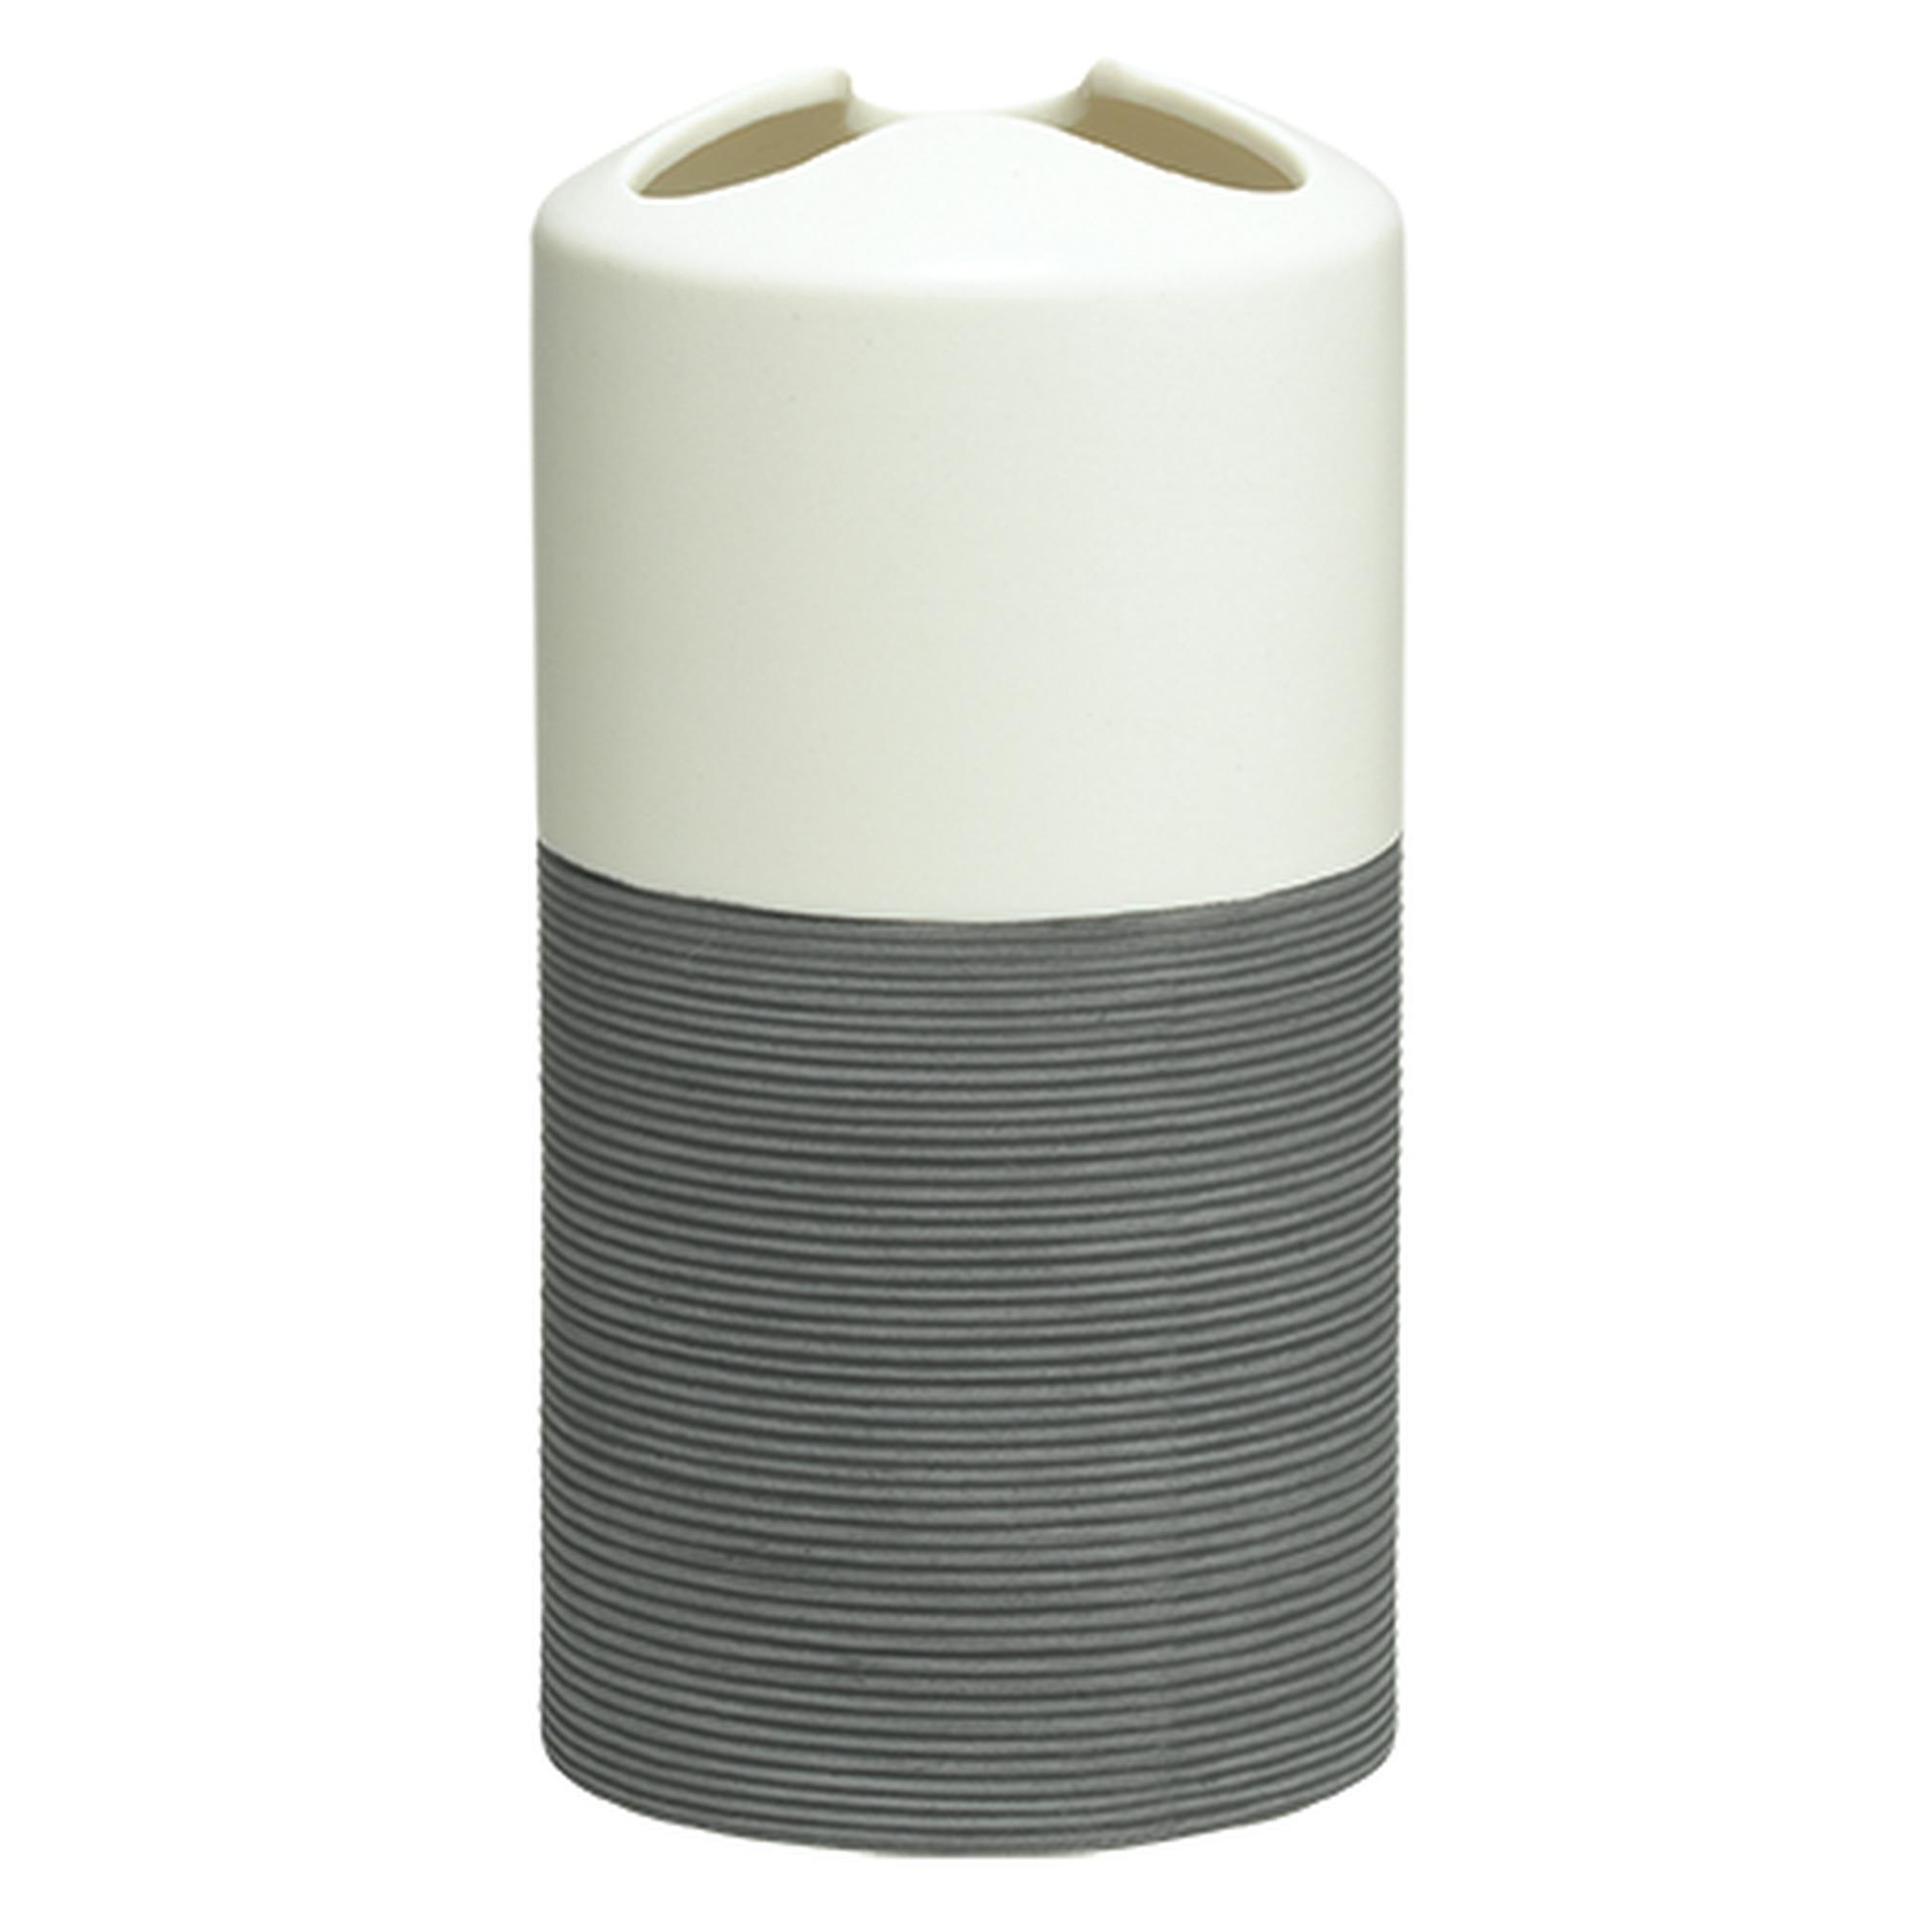 Sealskin Doppio tandenborstelhouder 7x14cm porselein grijs